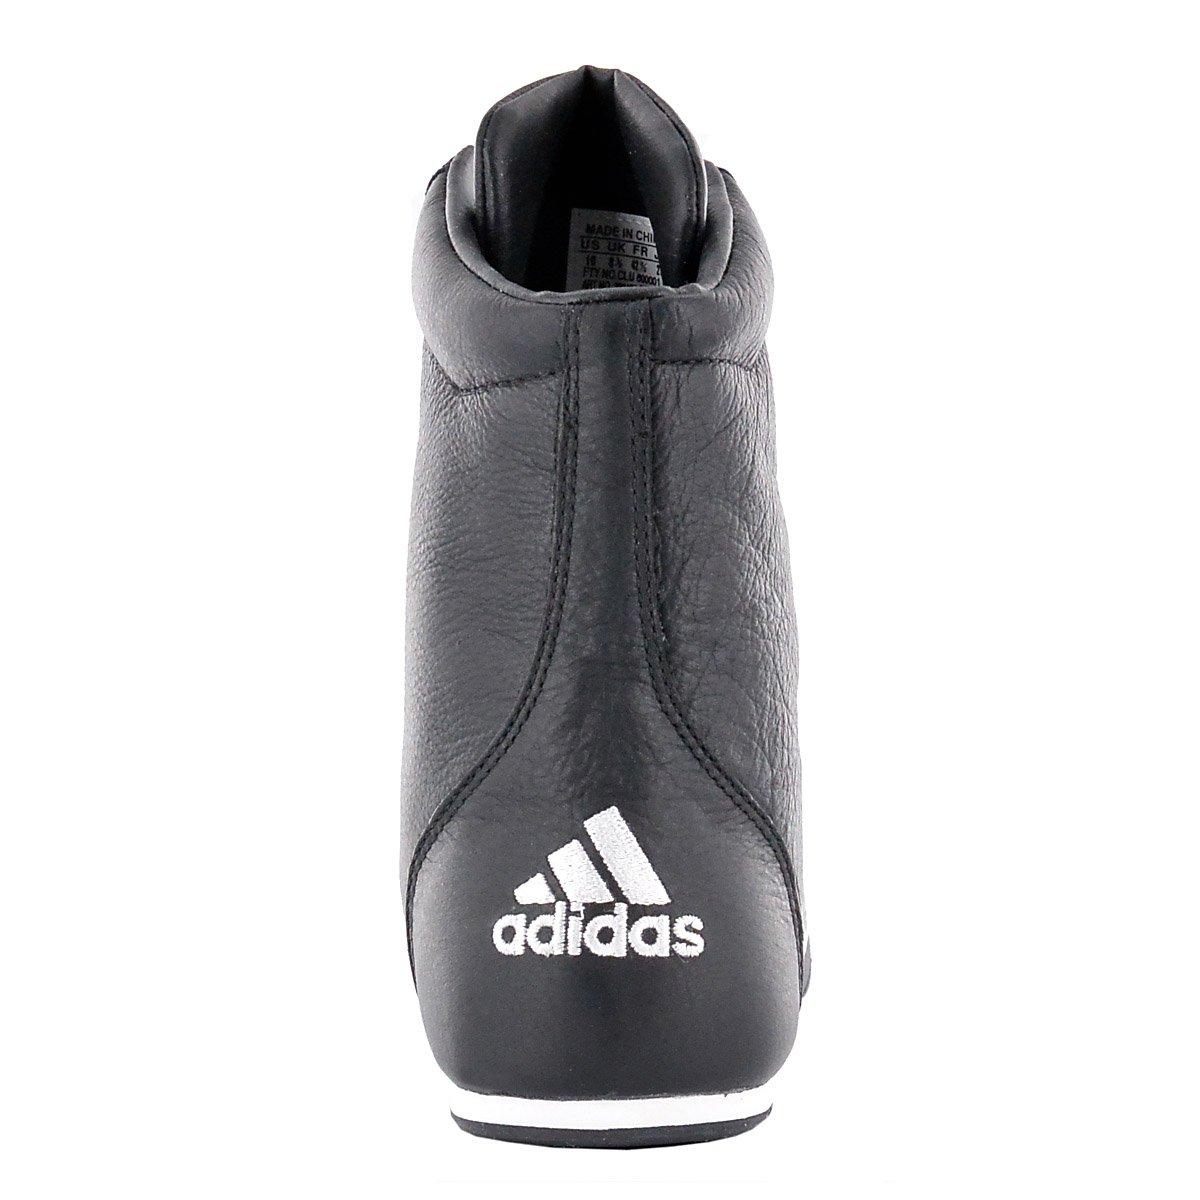 Adidas Prajna High 382158 Unisex Sneaker Schuhe Leder rsdtCBhQxo